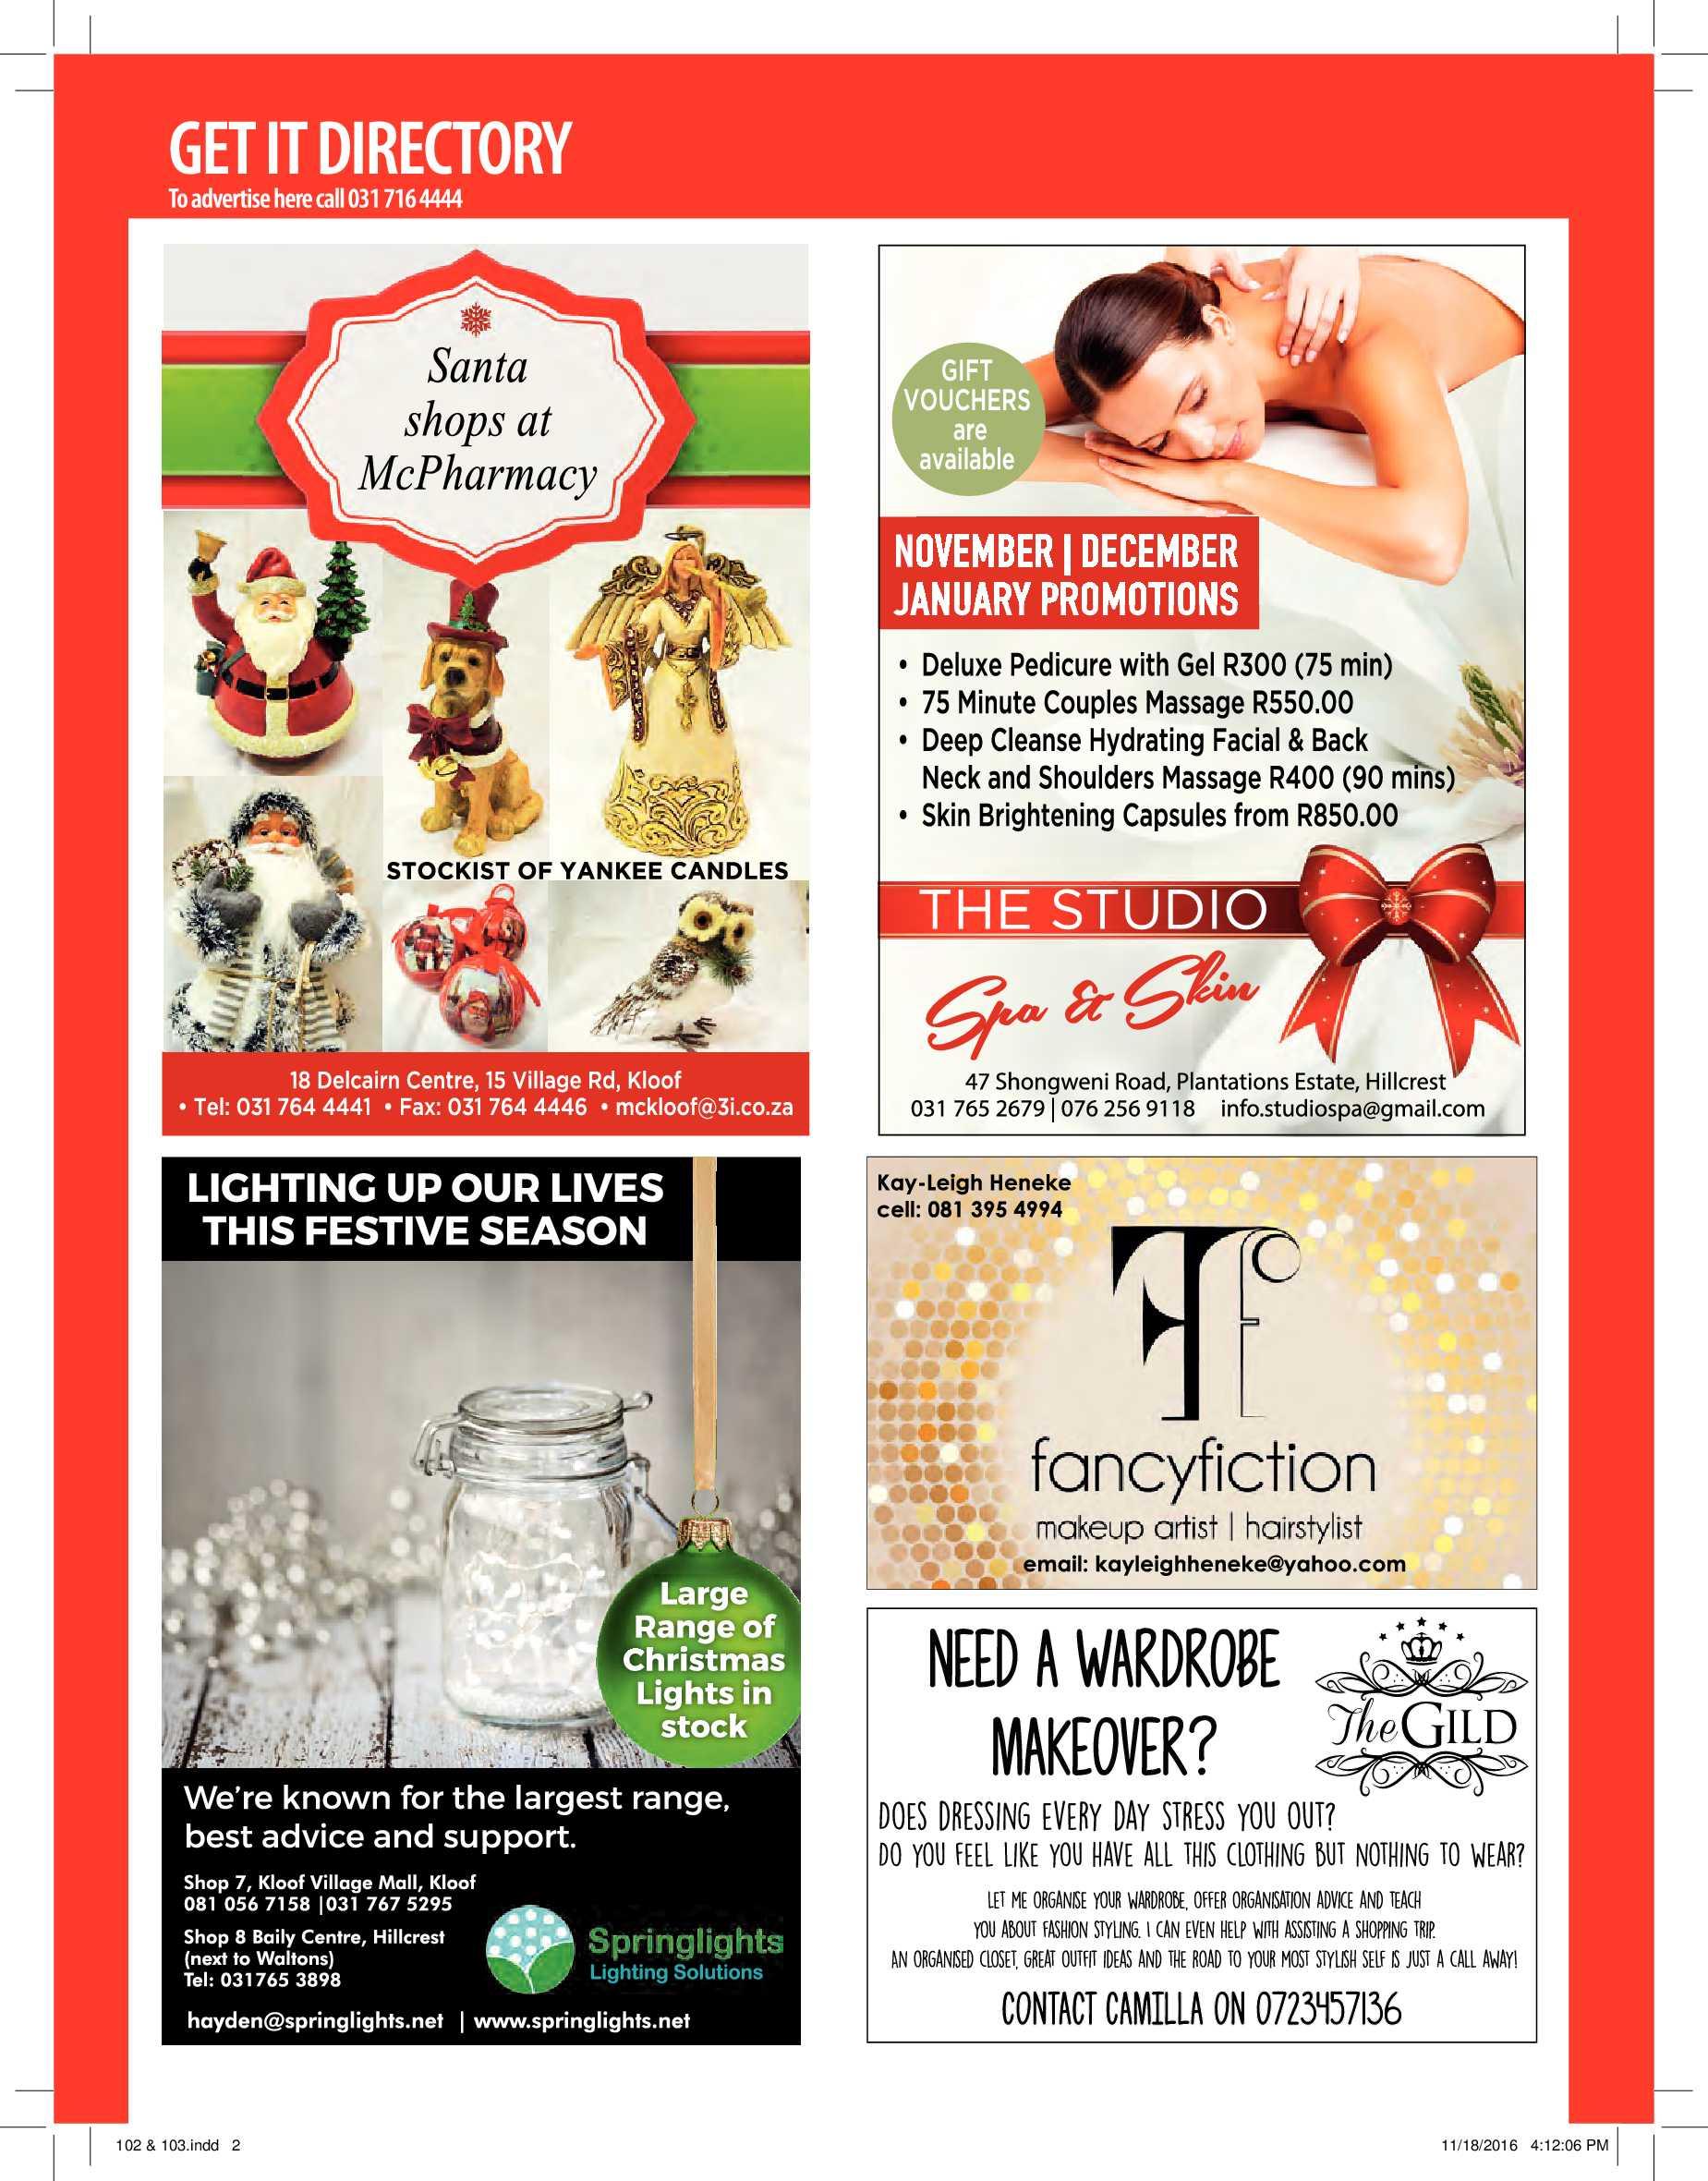 durban-get-it-magazine-december-2016-epapers-page-104